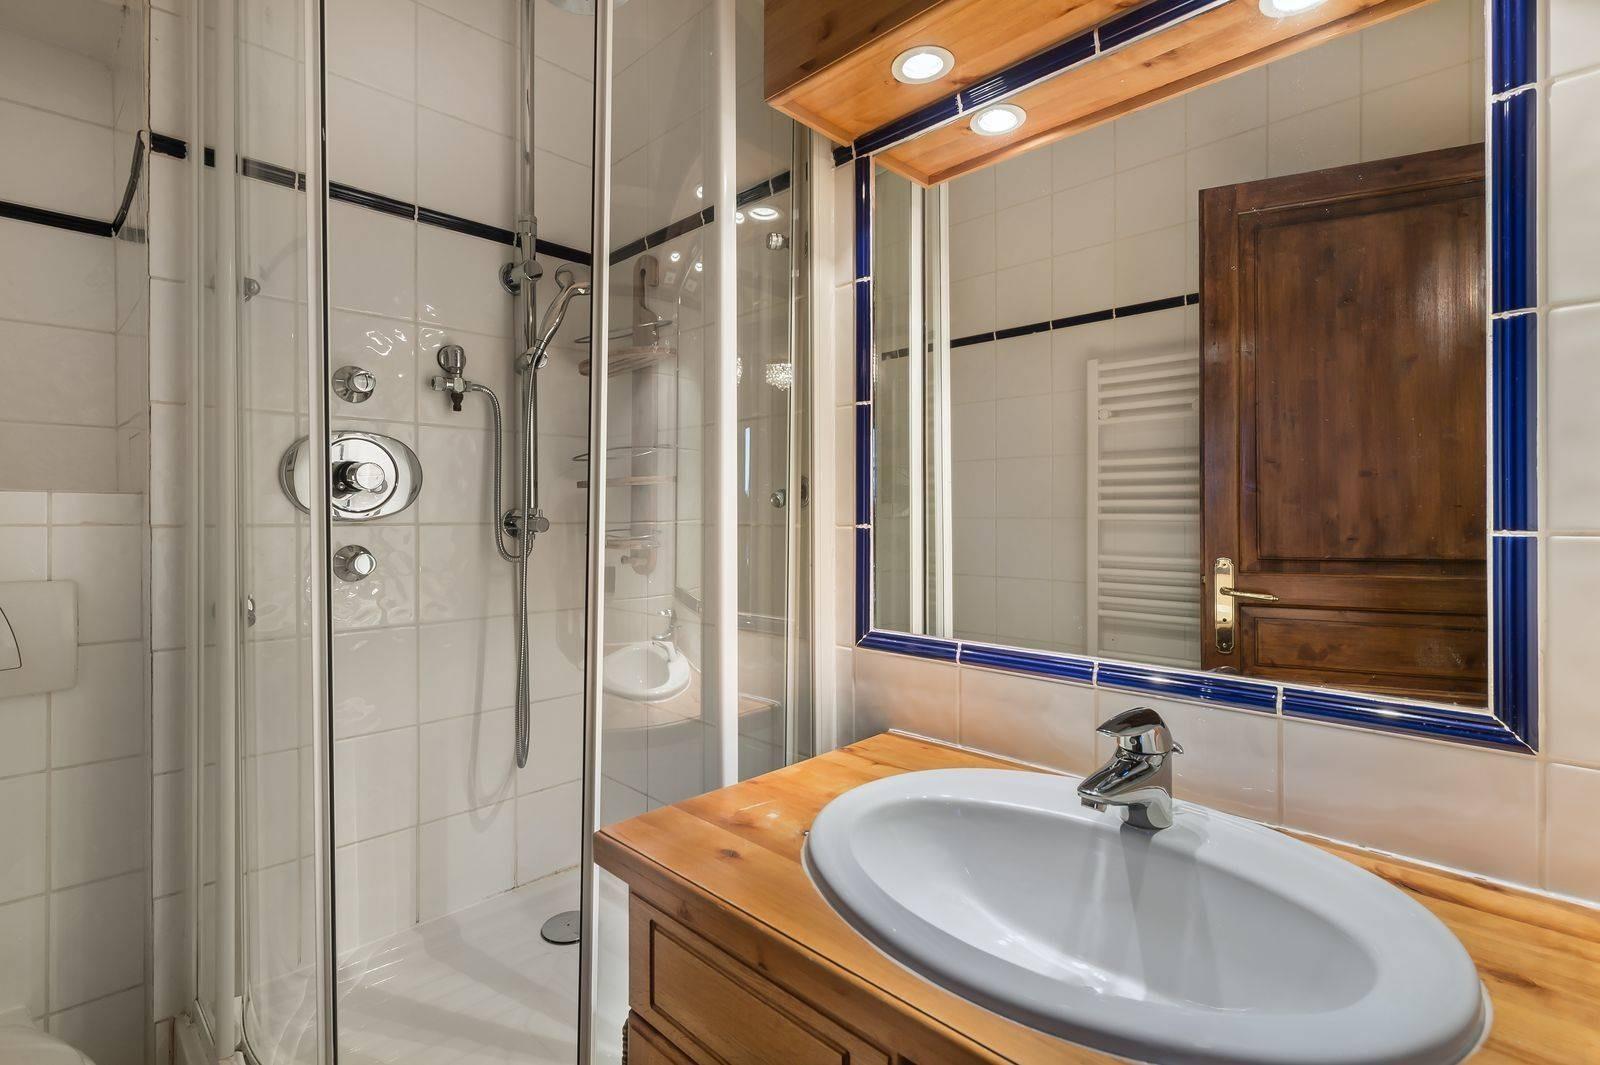 Courchevel 1850 Luxury Rental Appartment Calomel Bathroom 2